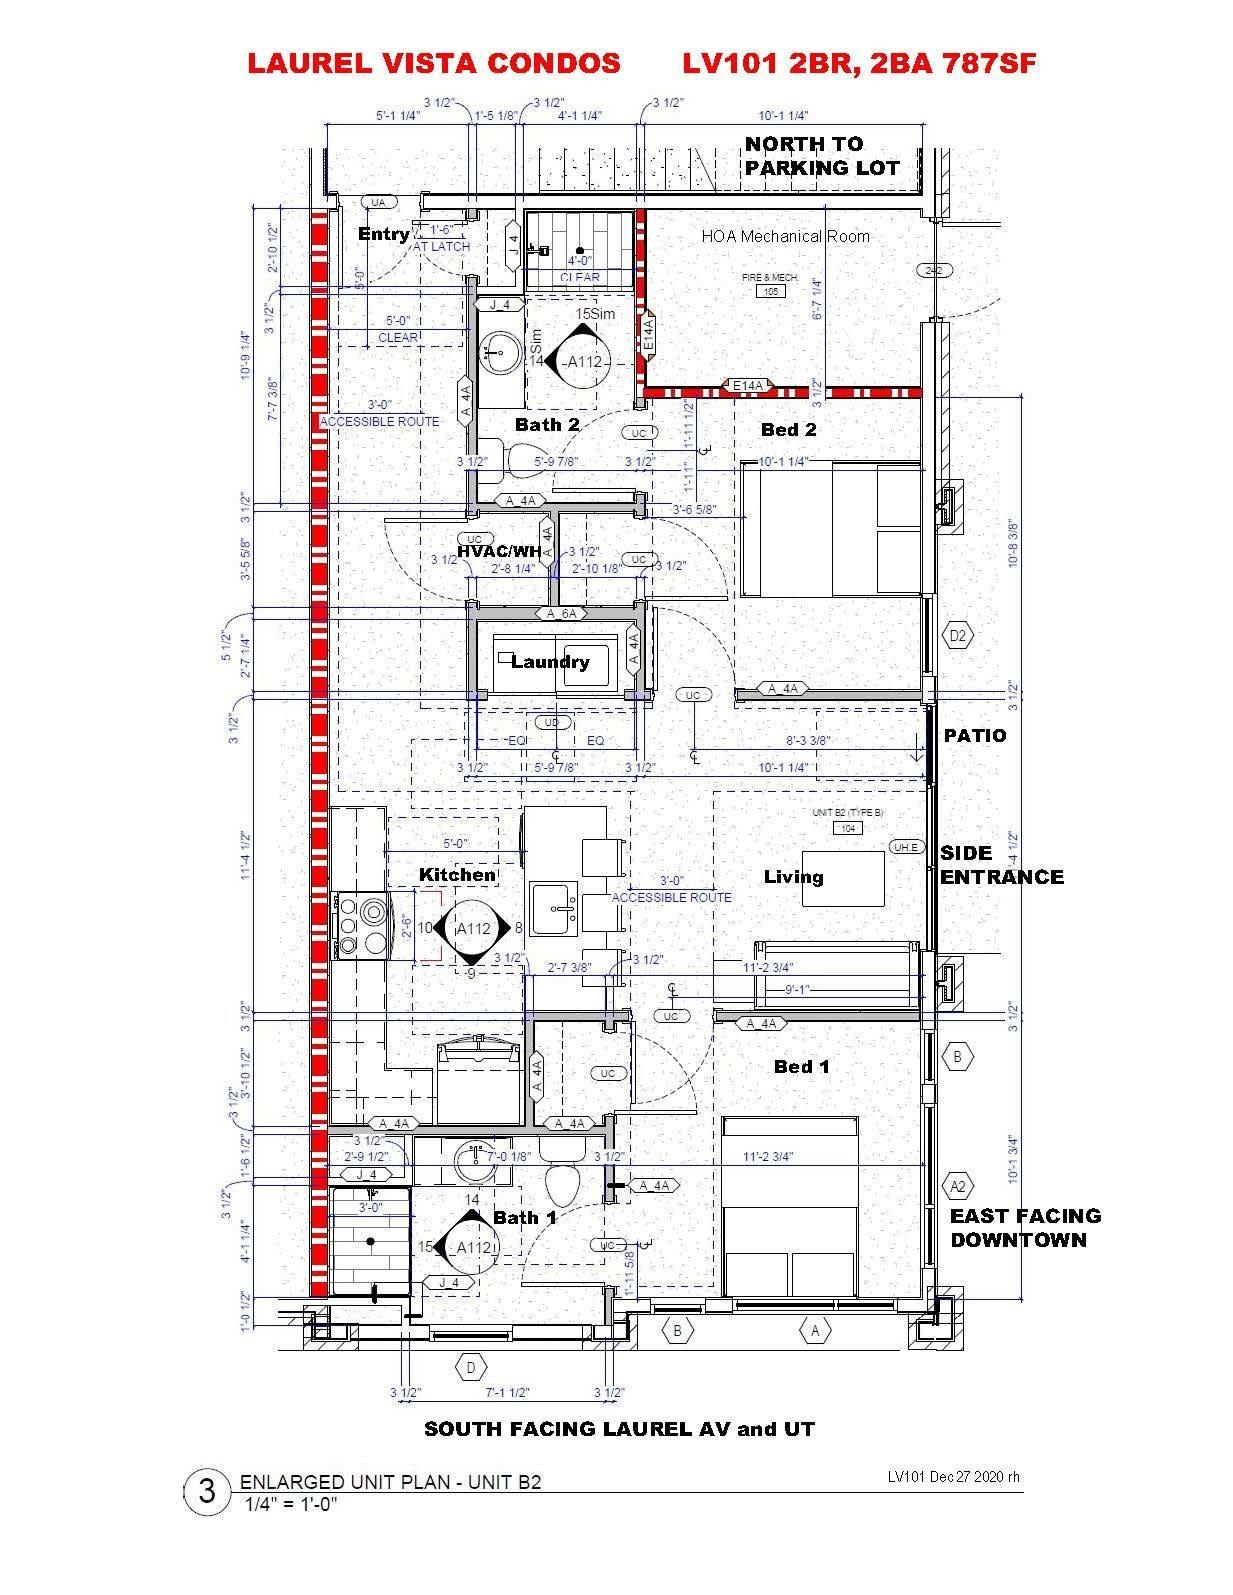 LV101 2BR,2BA - Floorplan 787SF